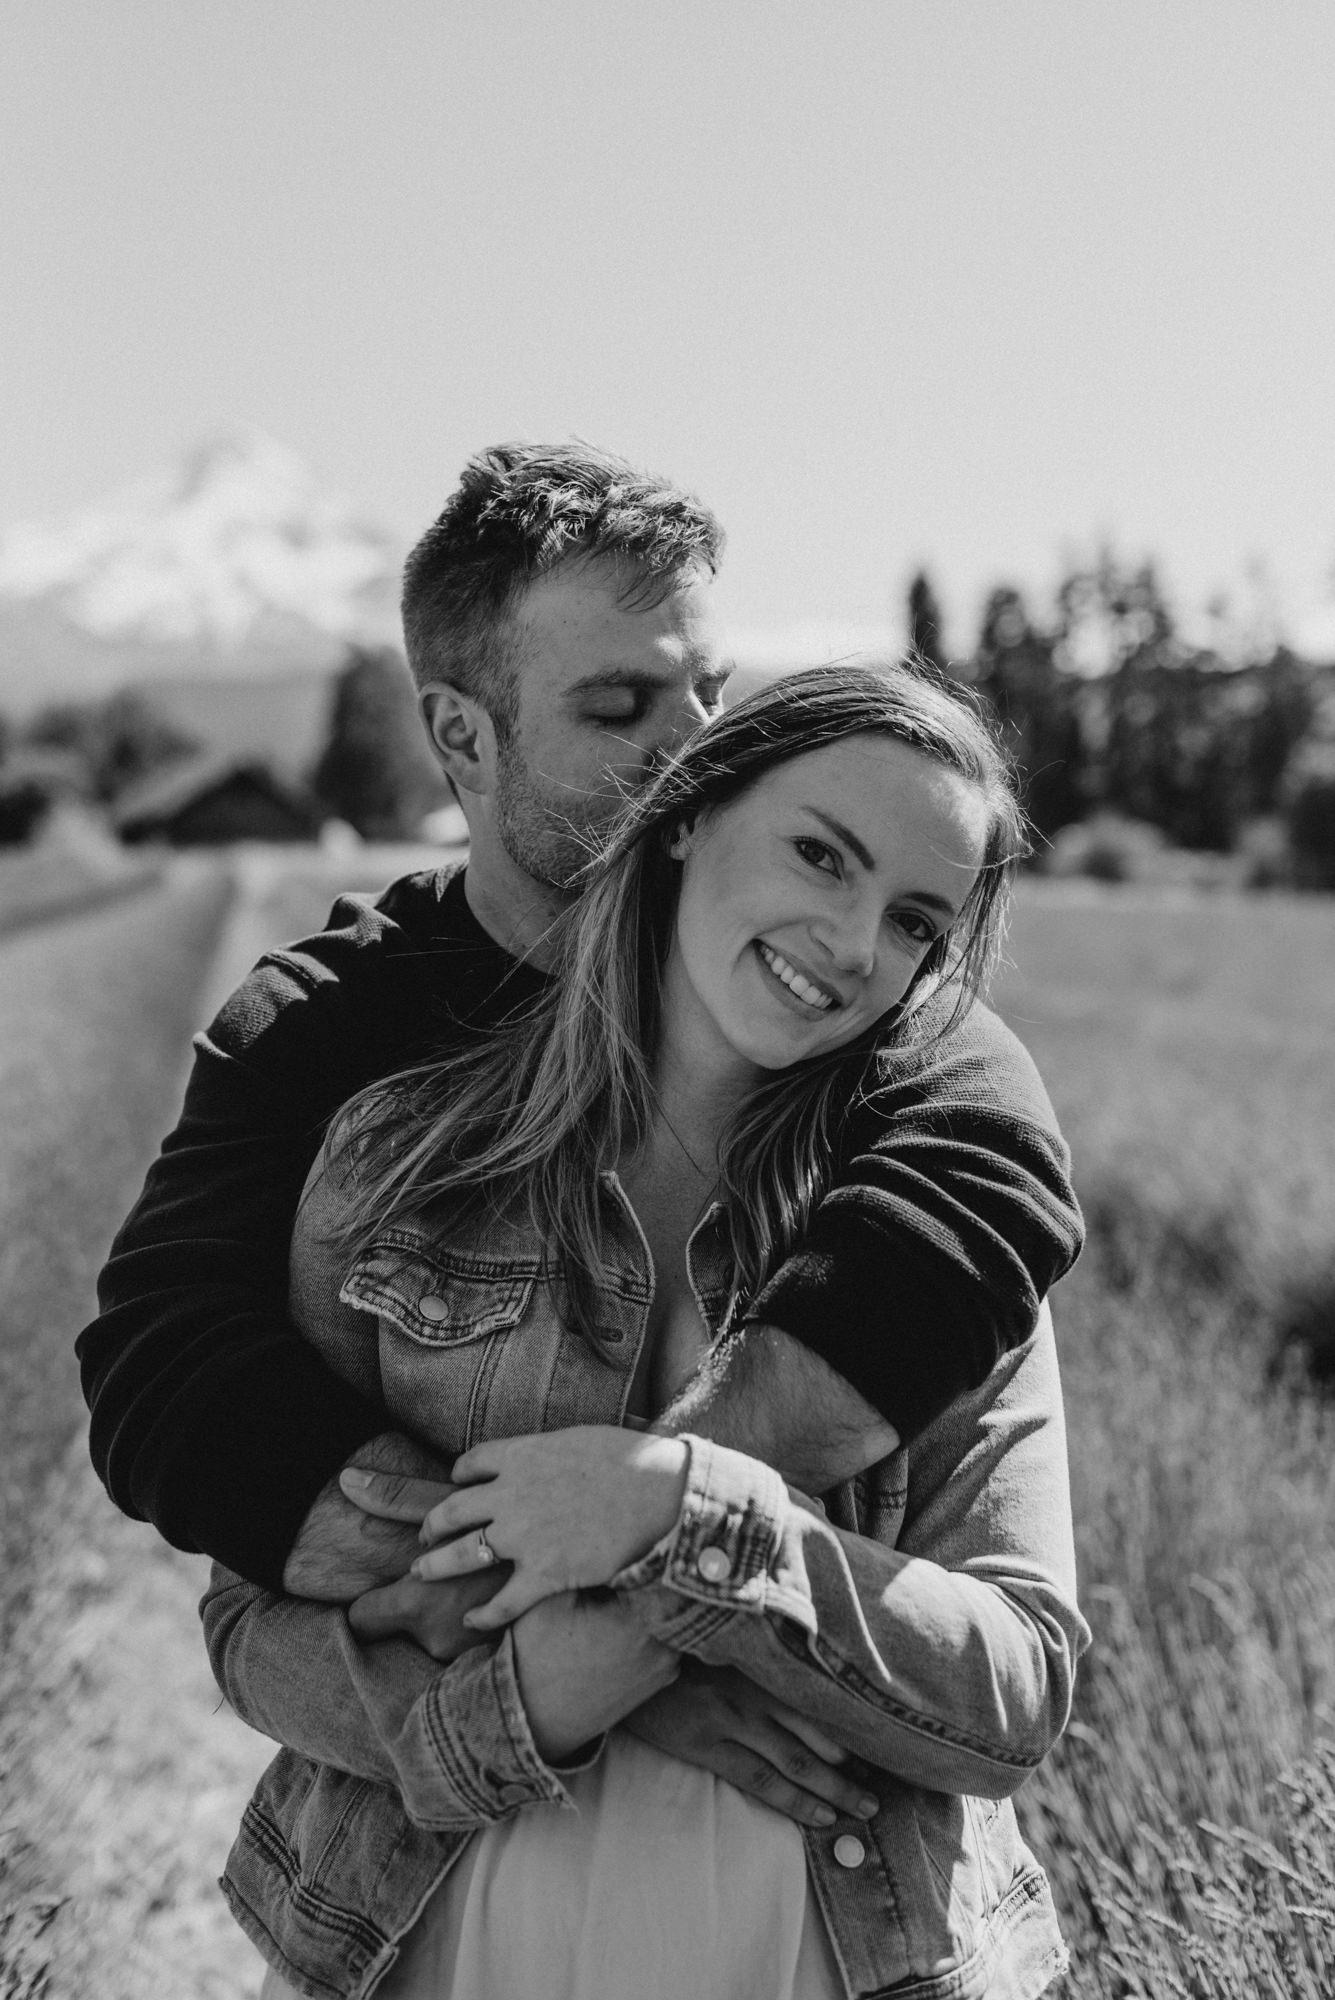 6-Mt-hood-lavender-farms-engagment-couple-summer-7070.jpg